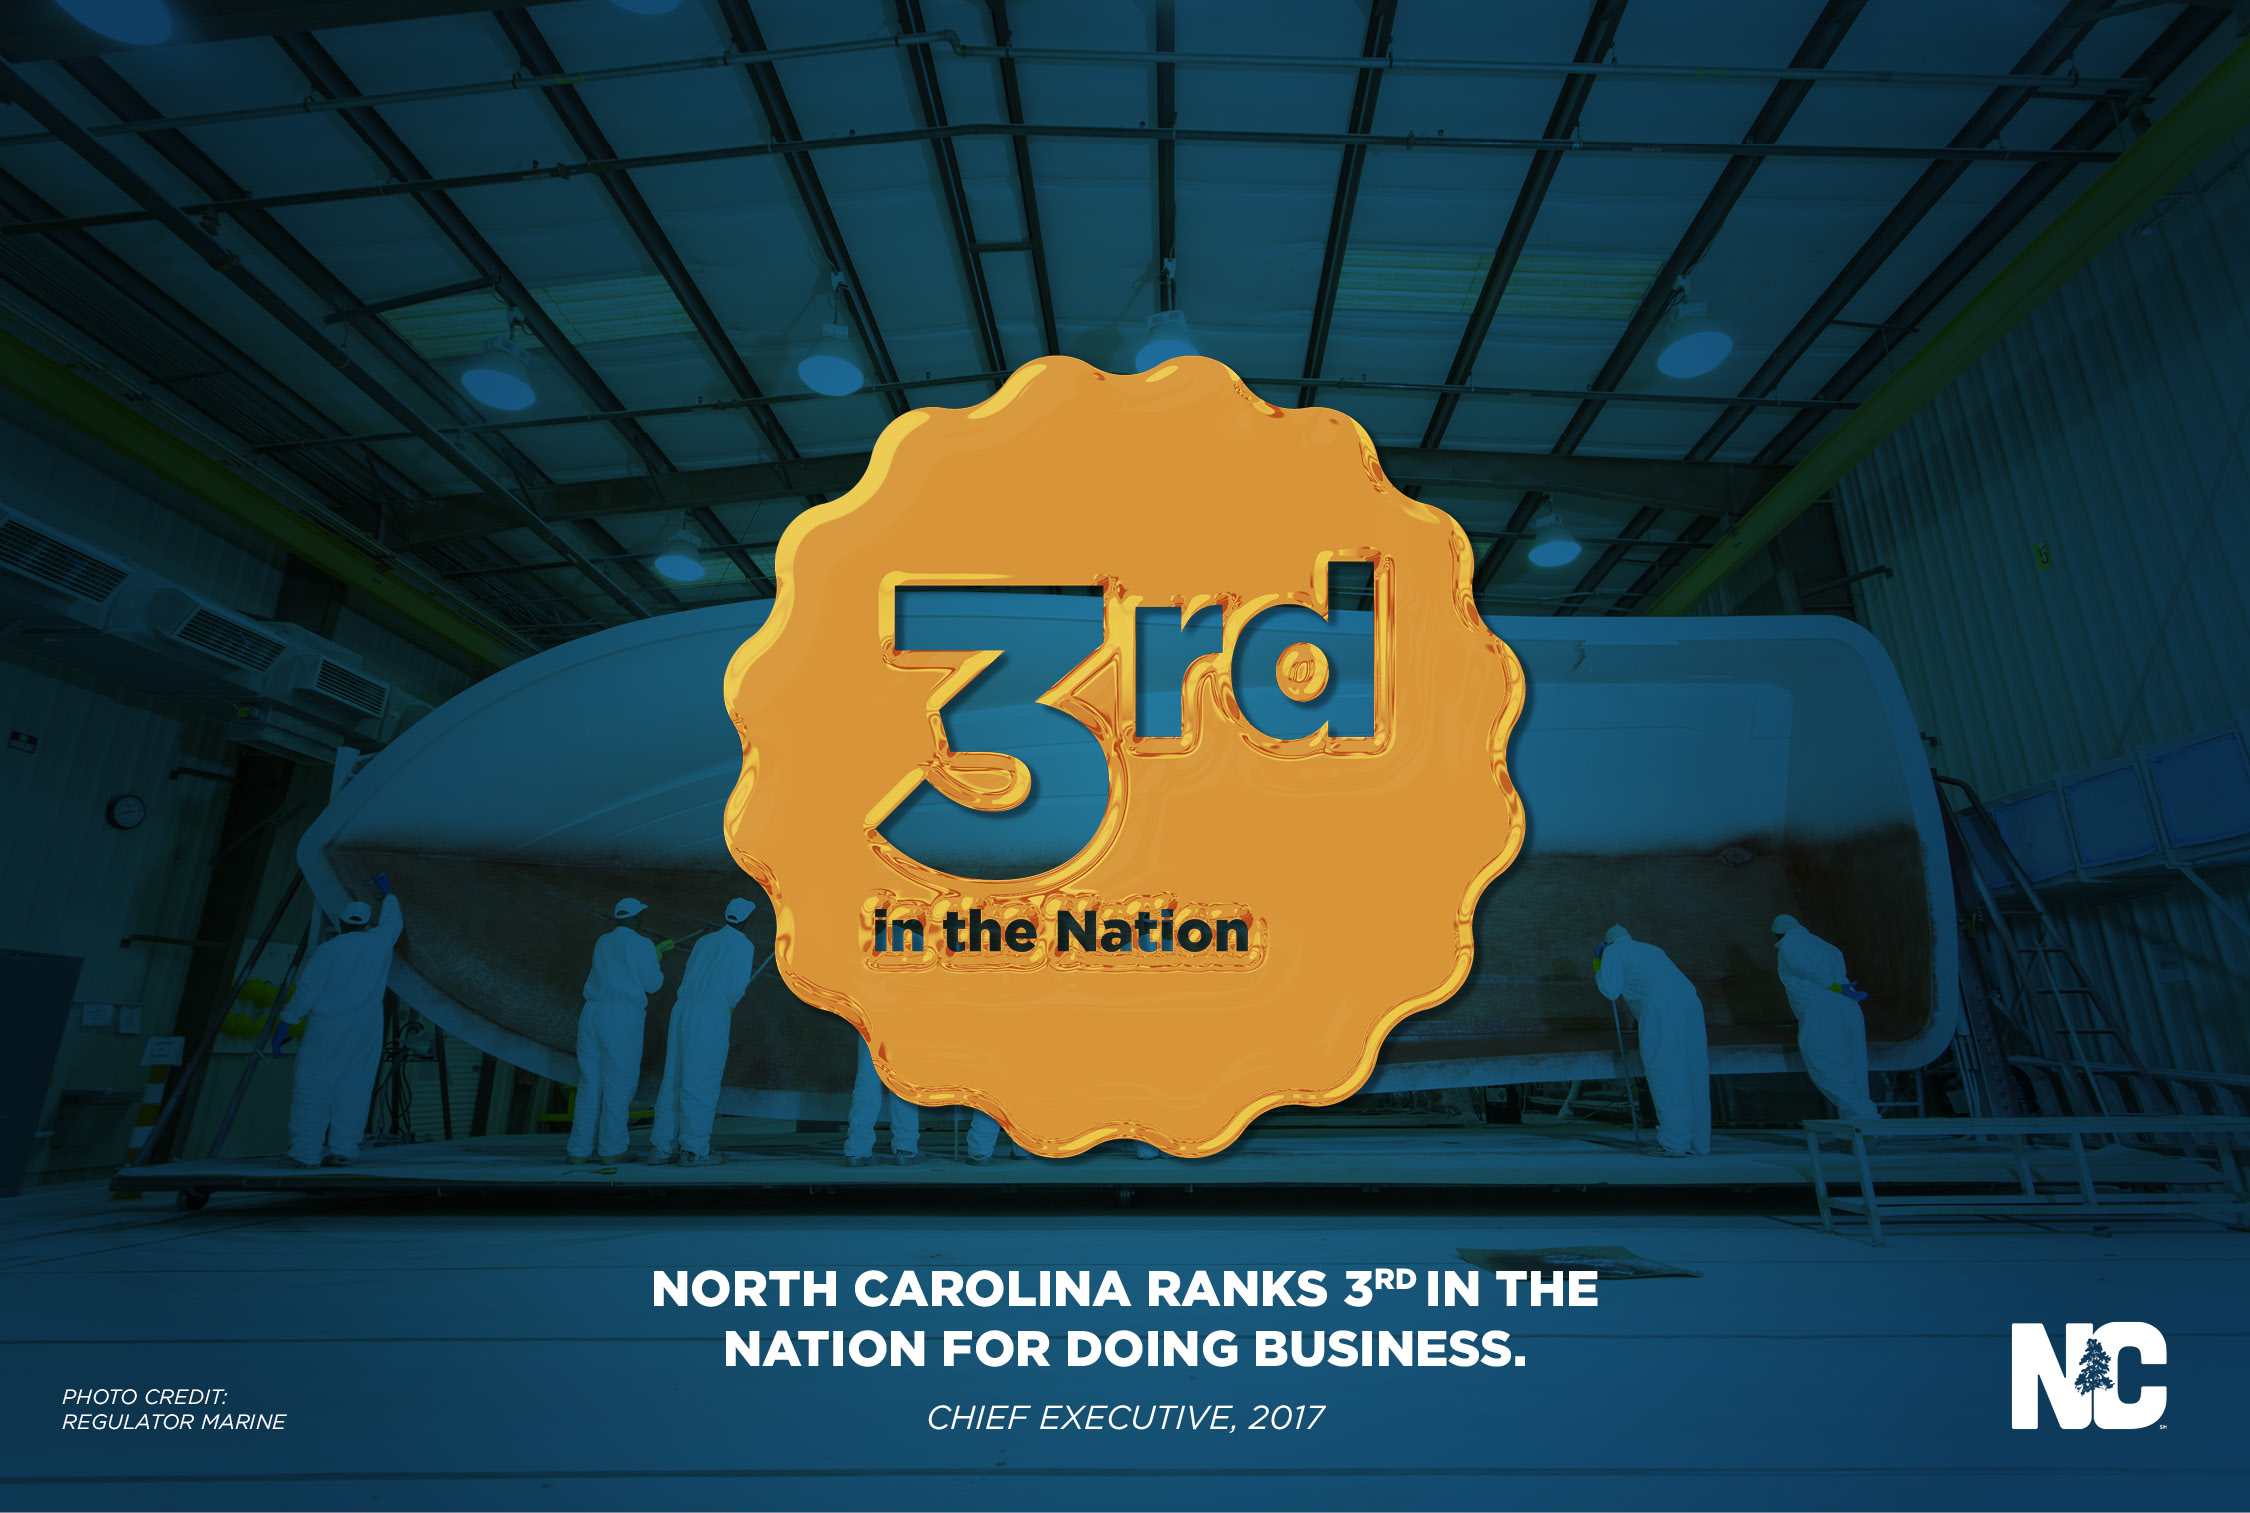 Survey of 500-plus CEOs Ranks North Carolina No. 3 State for Business